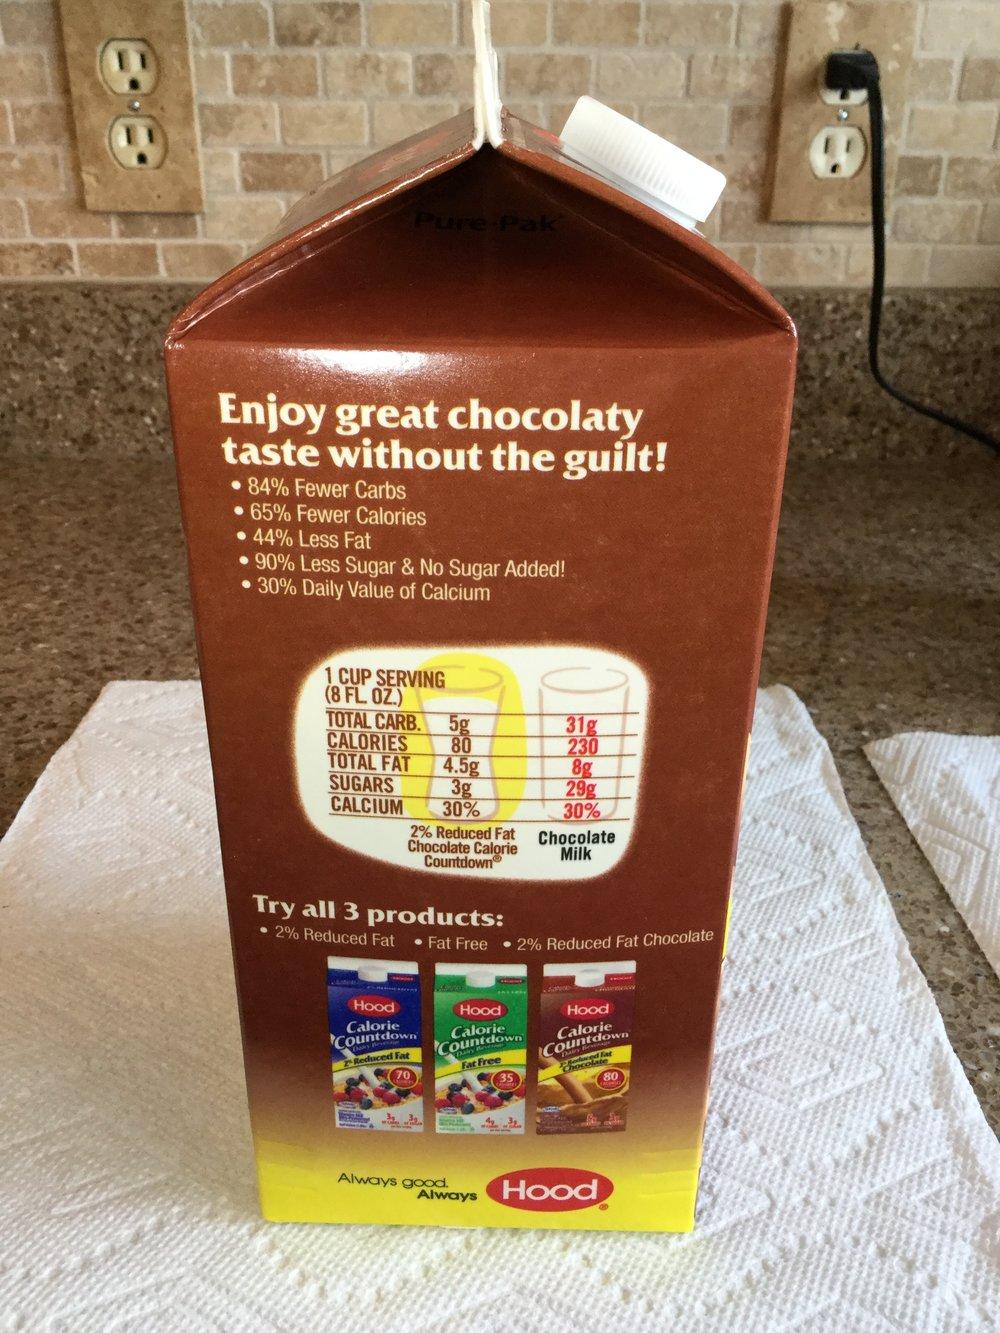 Hood Calorie Countdown 2% Chocolate Dairy Beverage Side 2